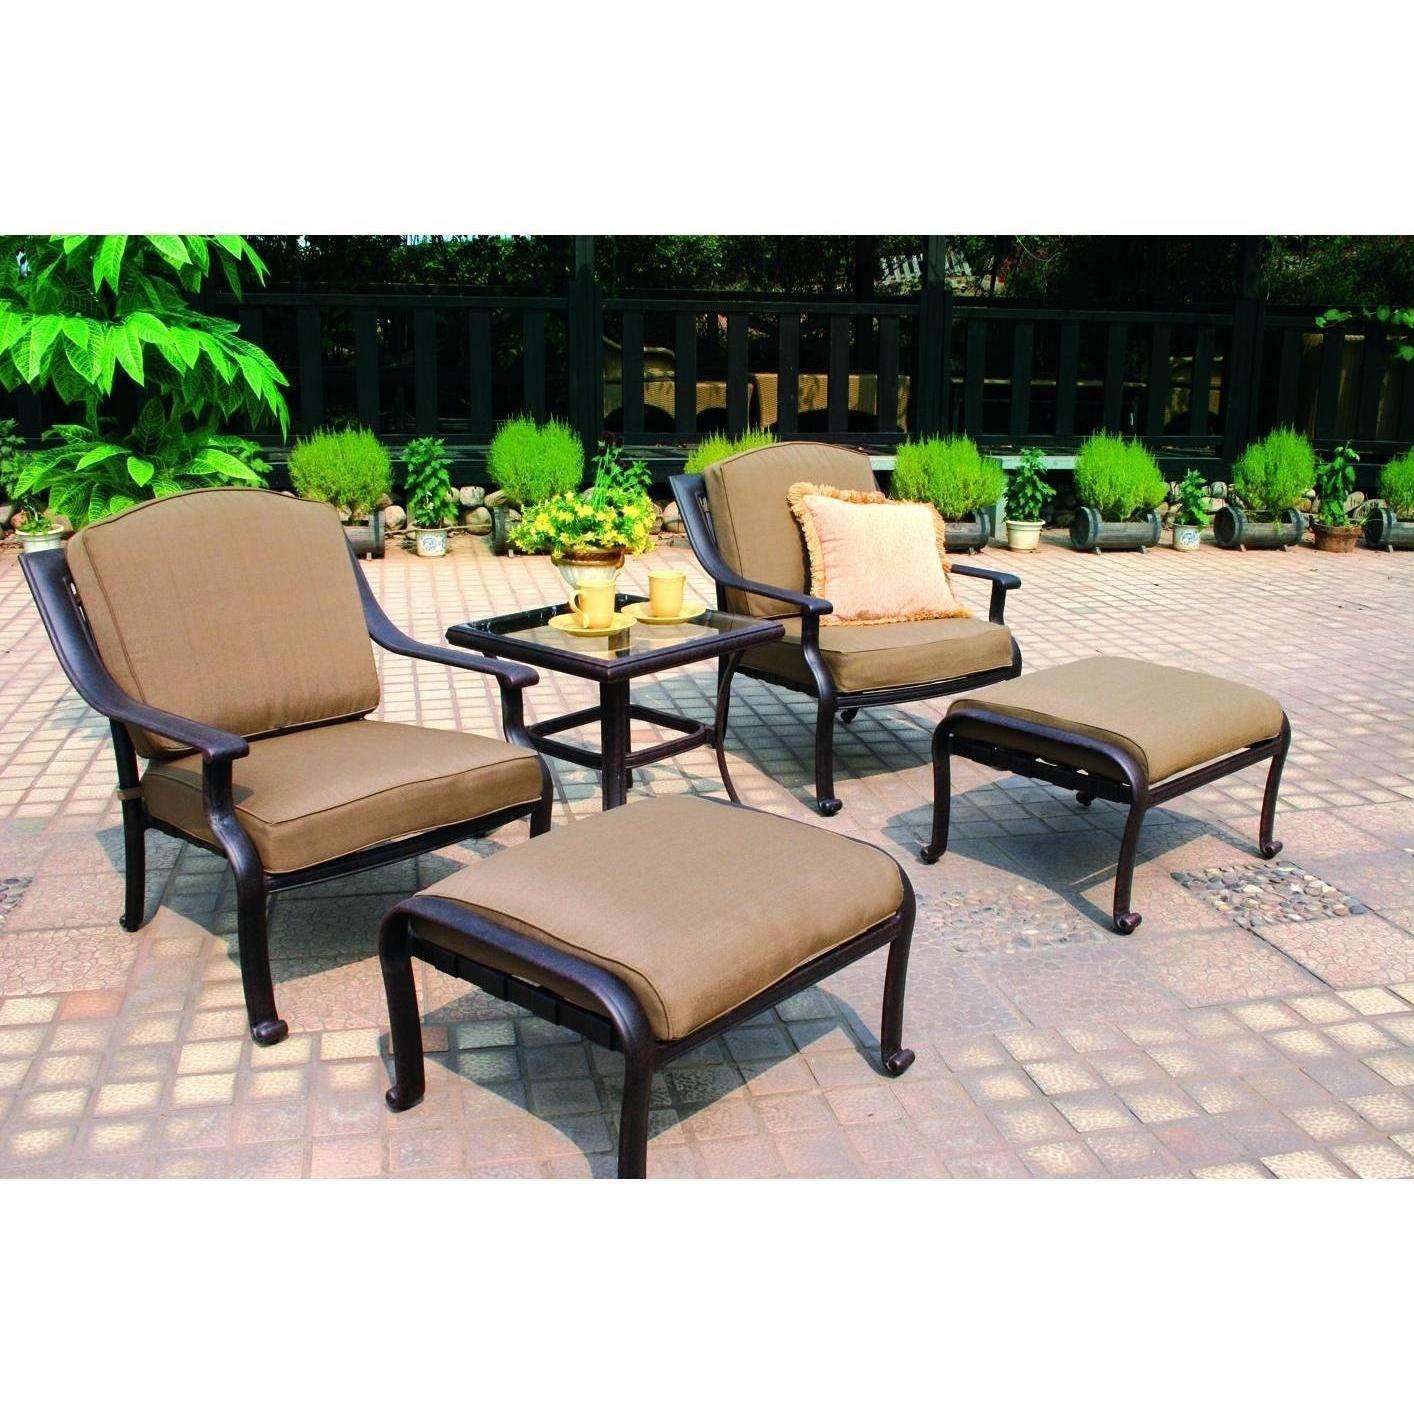 Darlee Ten Star 5 Piece Aluminum Patio Conversation Seating Set